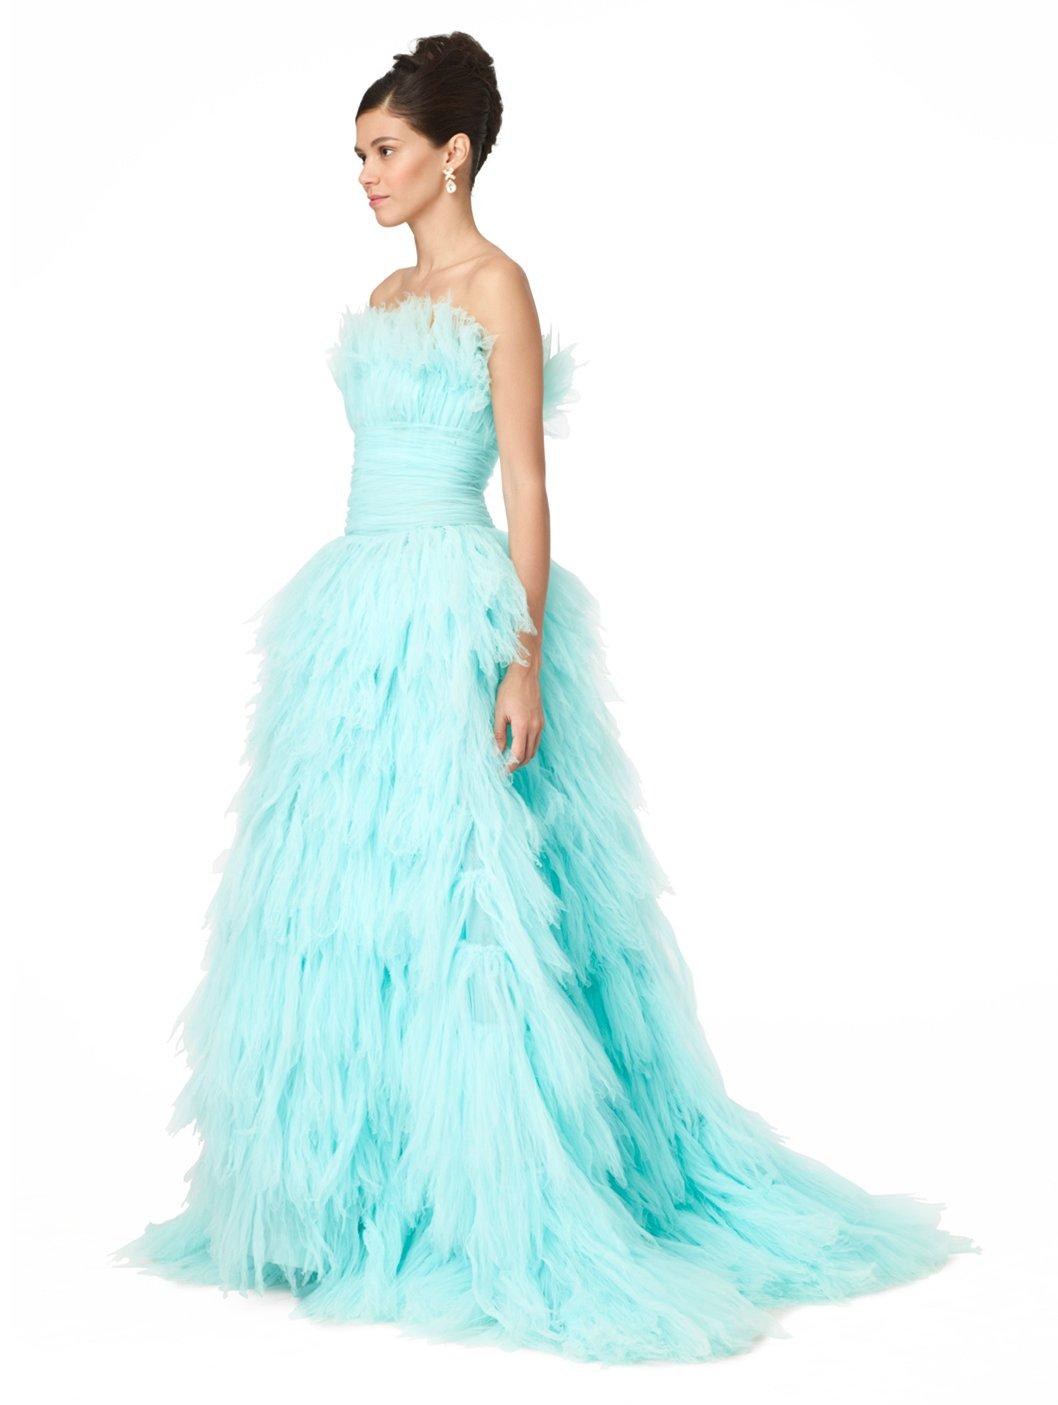 Lyst - Oscar De La Renta Strpls Crush Pleated Tiered Gown in Blue